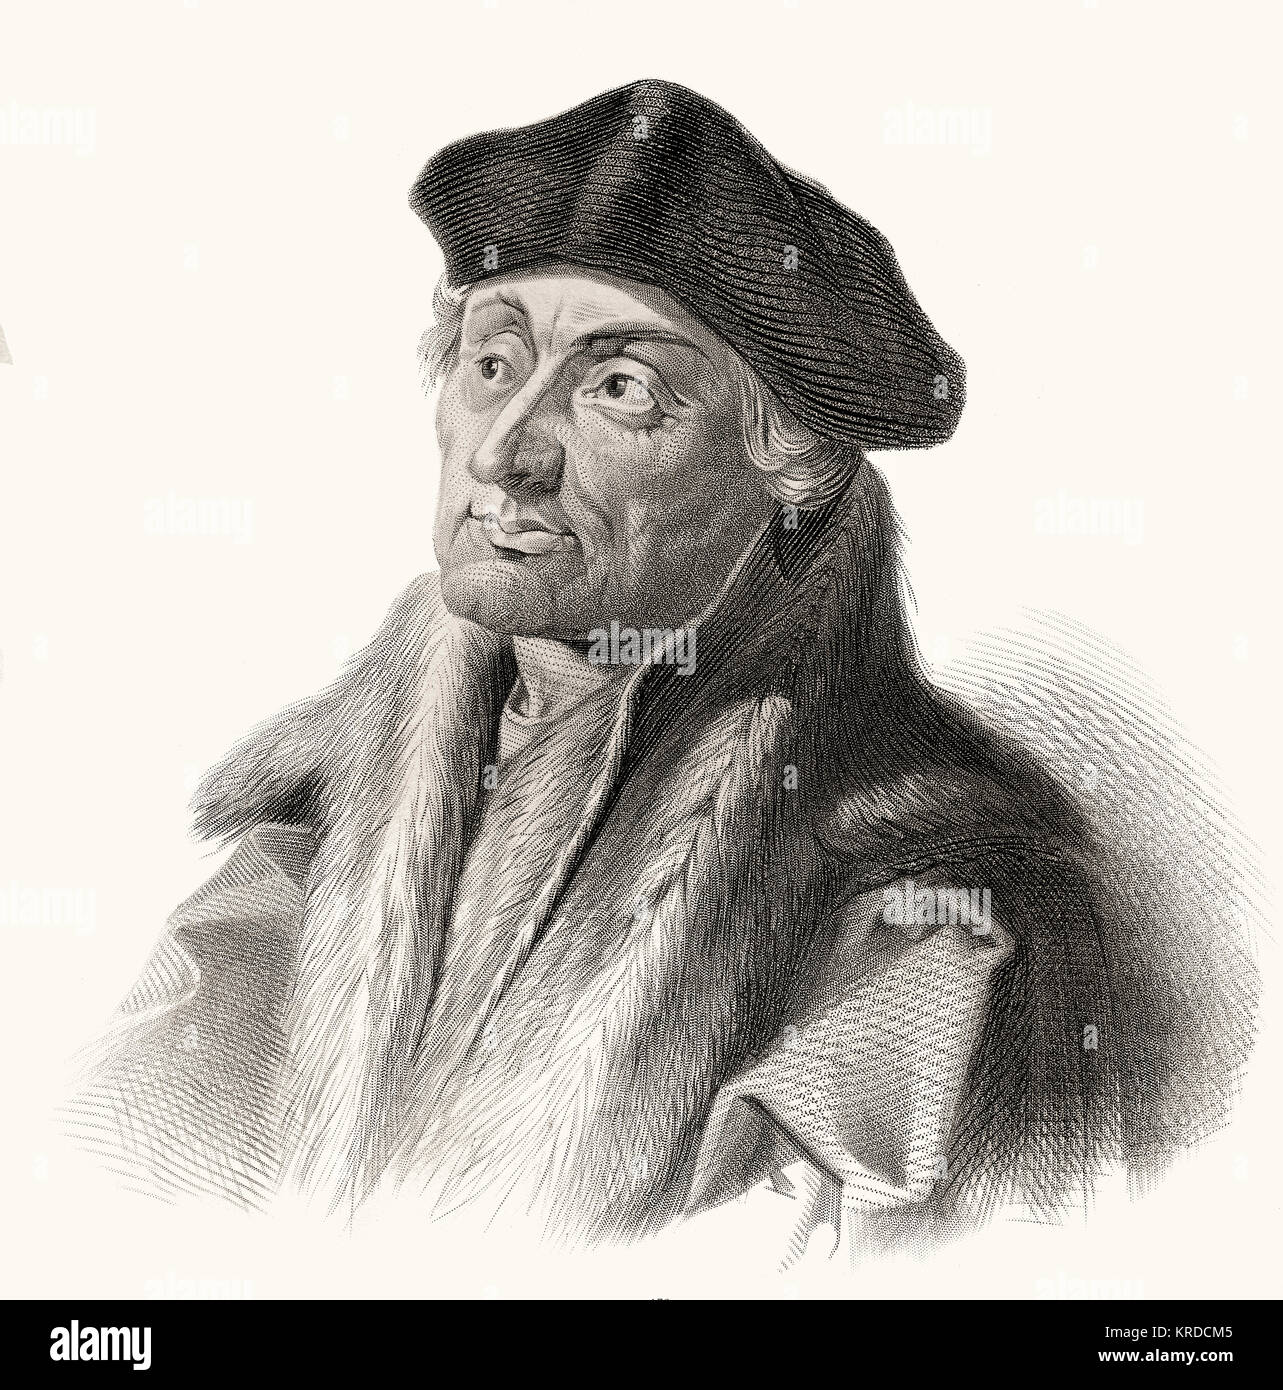 Erasmus Desiderius von Rotterdam, 1465 - 1536, a Dutch humanist, theologian, philosopher, scholar and author, - Stock Image